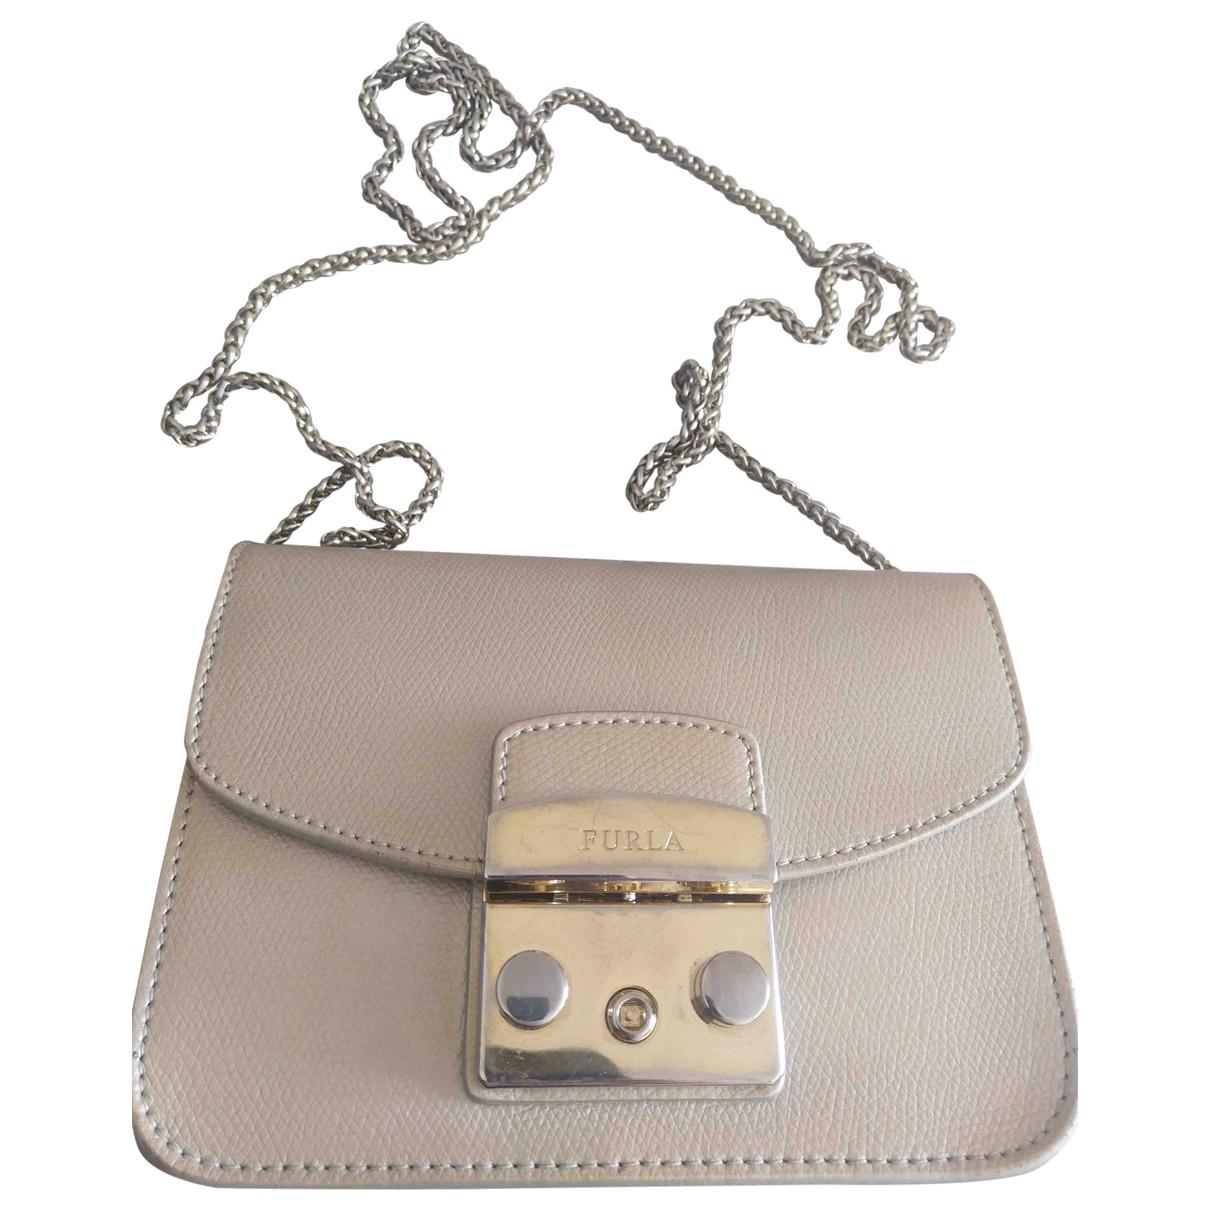 Furla Metropolis Metallic Leather handbag for Women \N